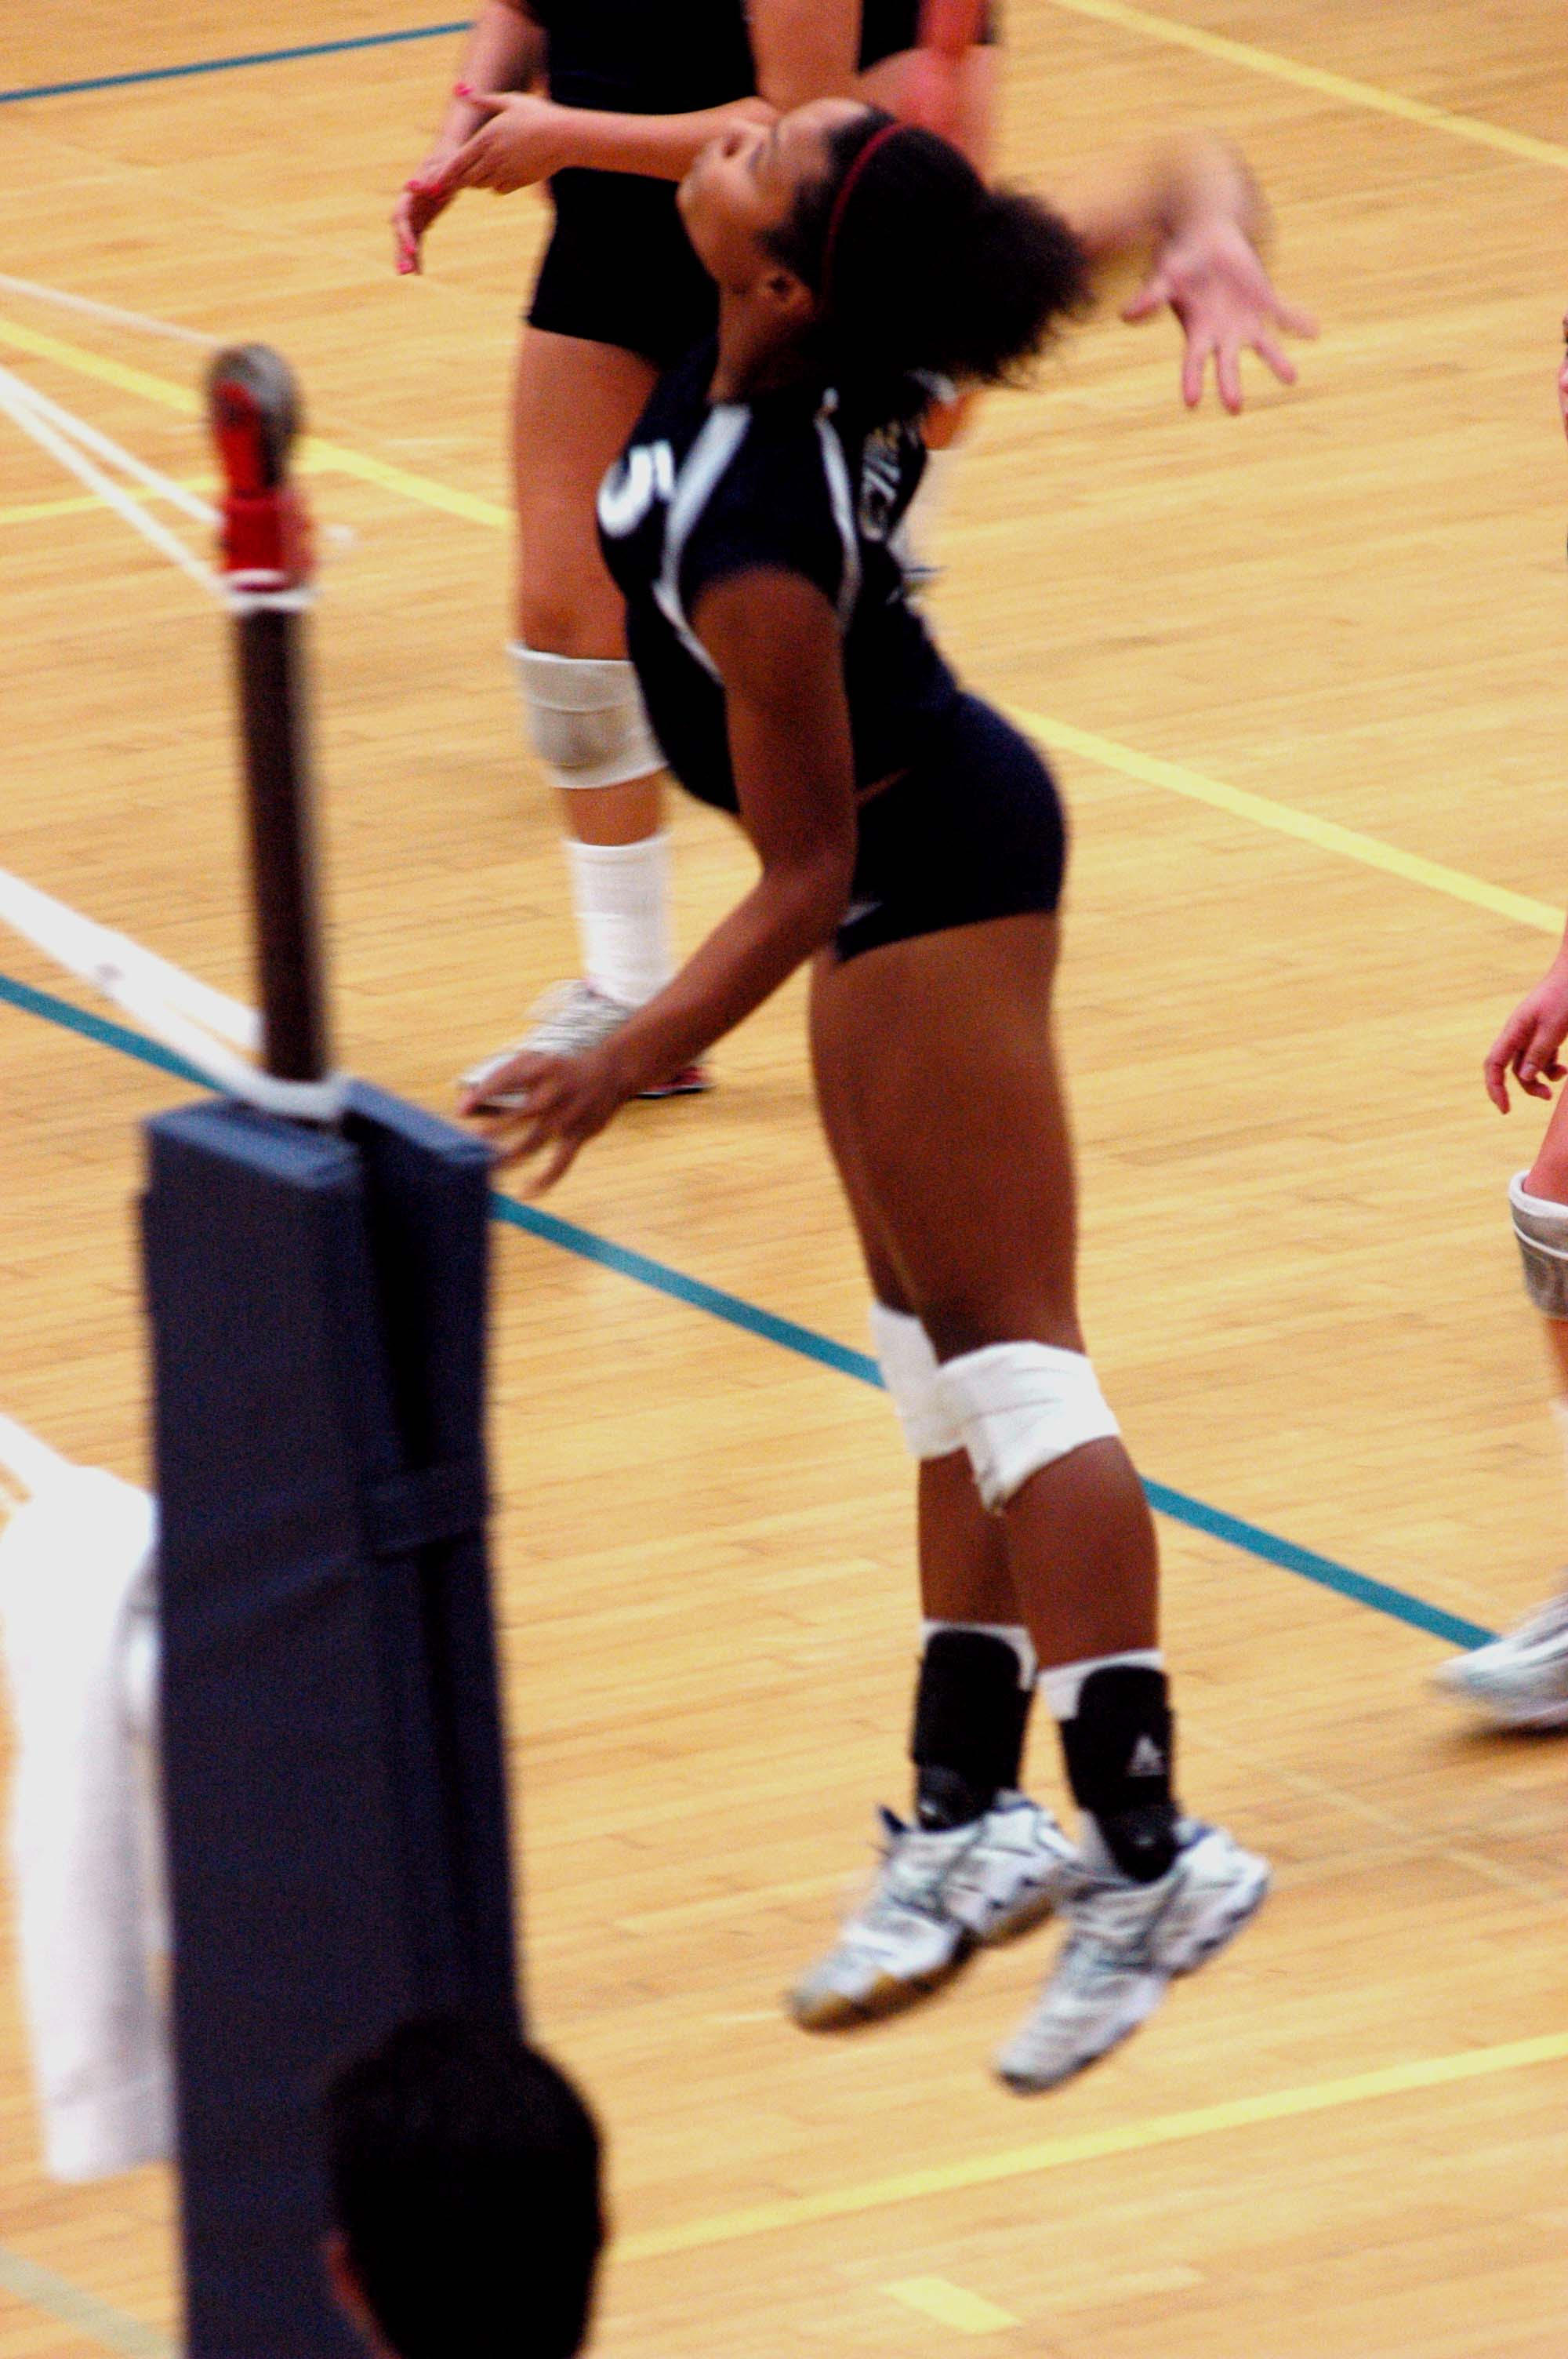 Women's volleyball by arivera626